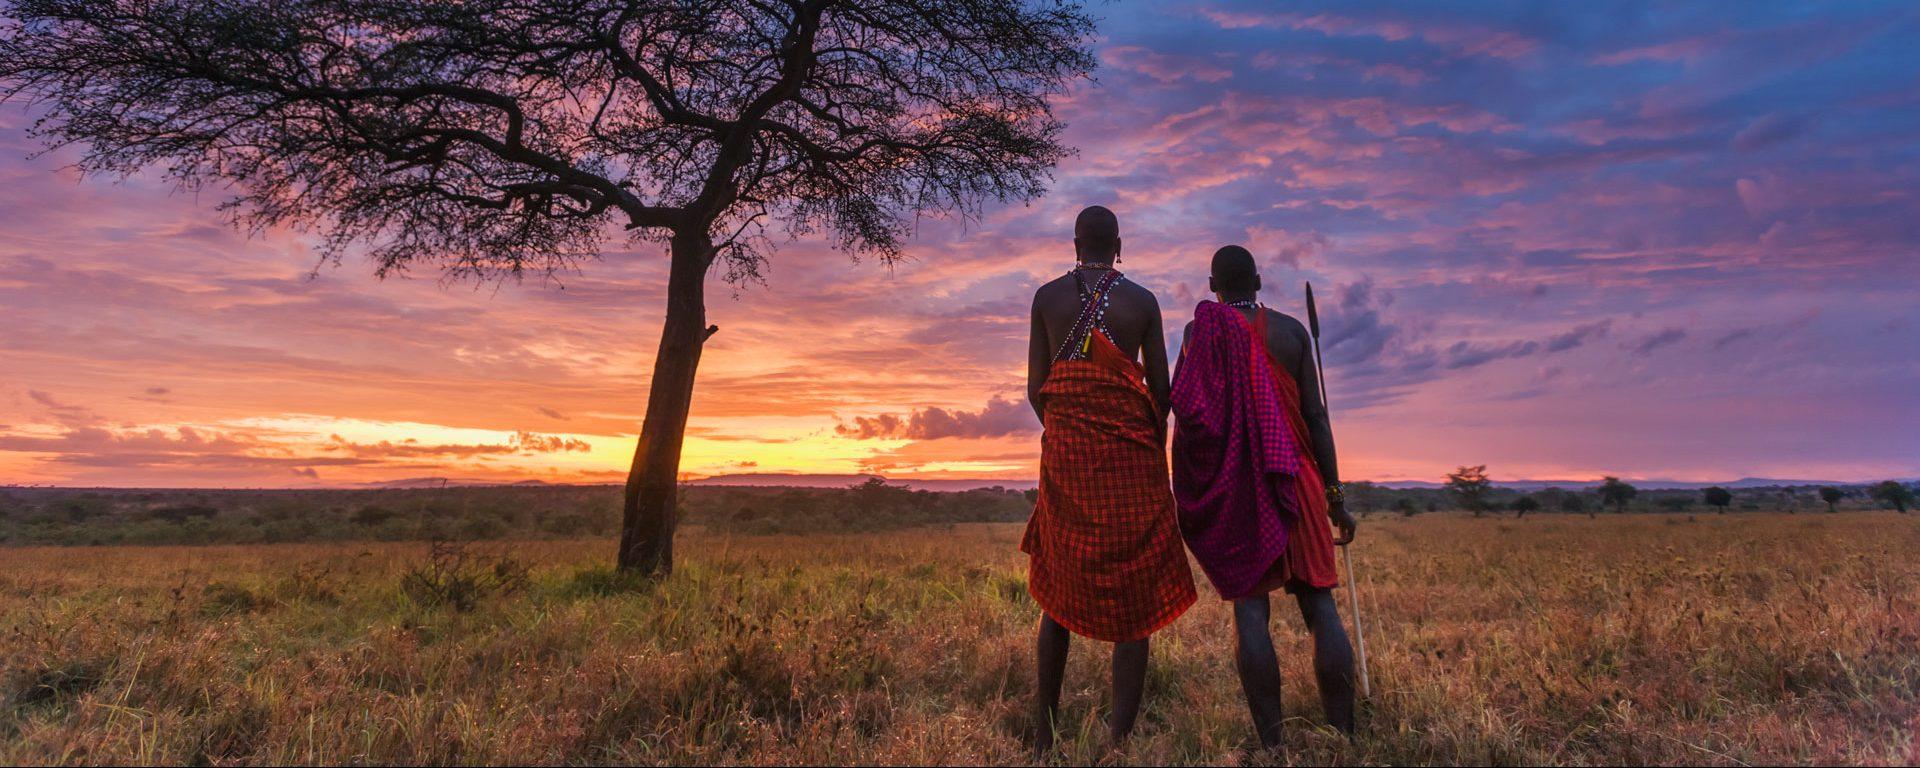 Two Maasai tribesman at dawn in the Masai Mara, Kenya